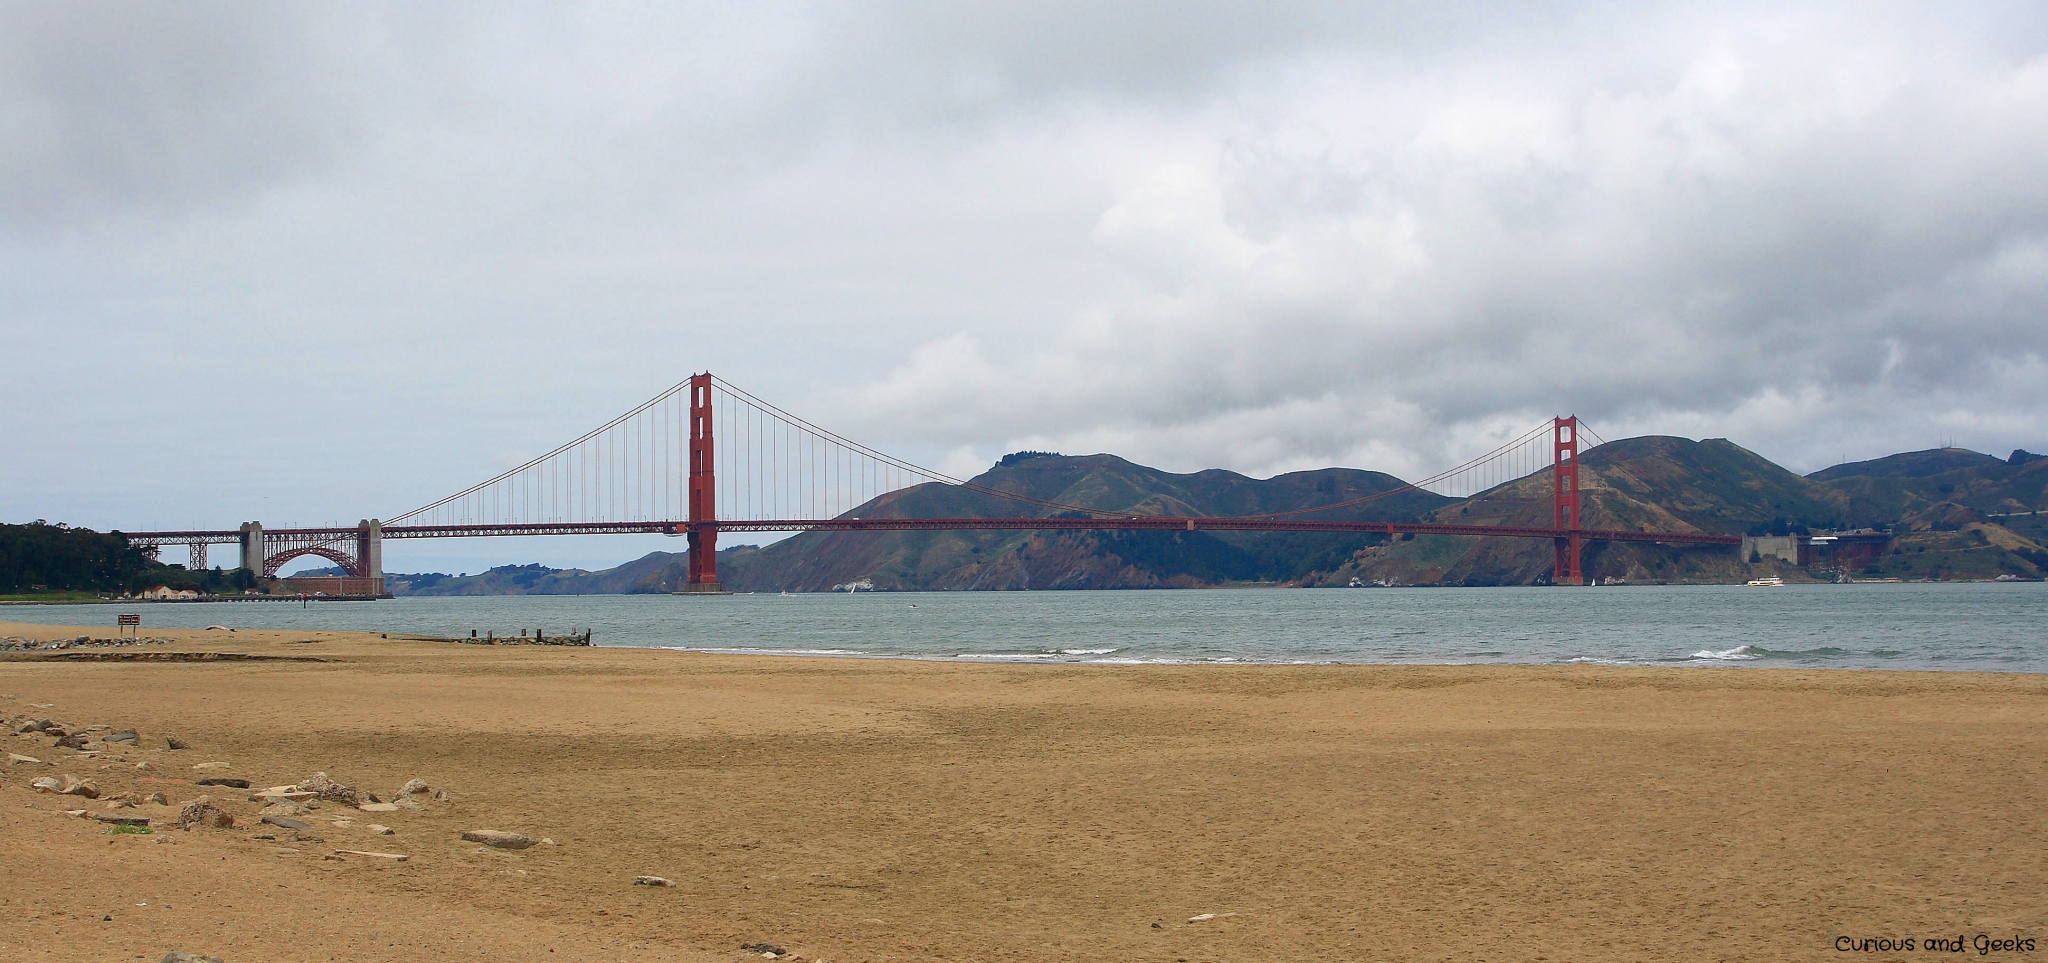 West Coast USA Road Trip San Francisco Golden Bridge - Our three-week West Coast USA Road Trip